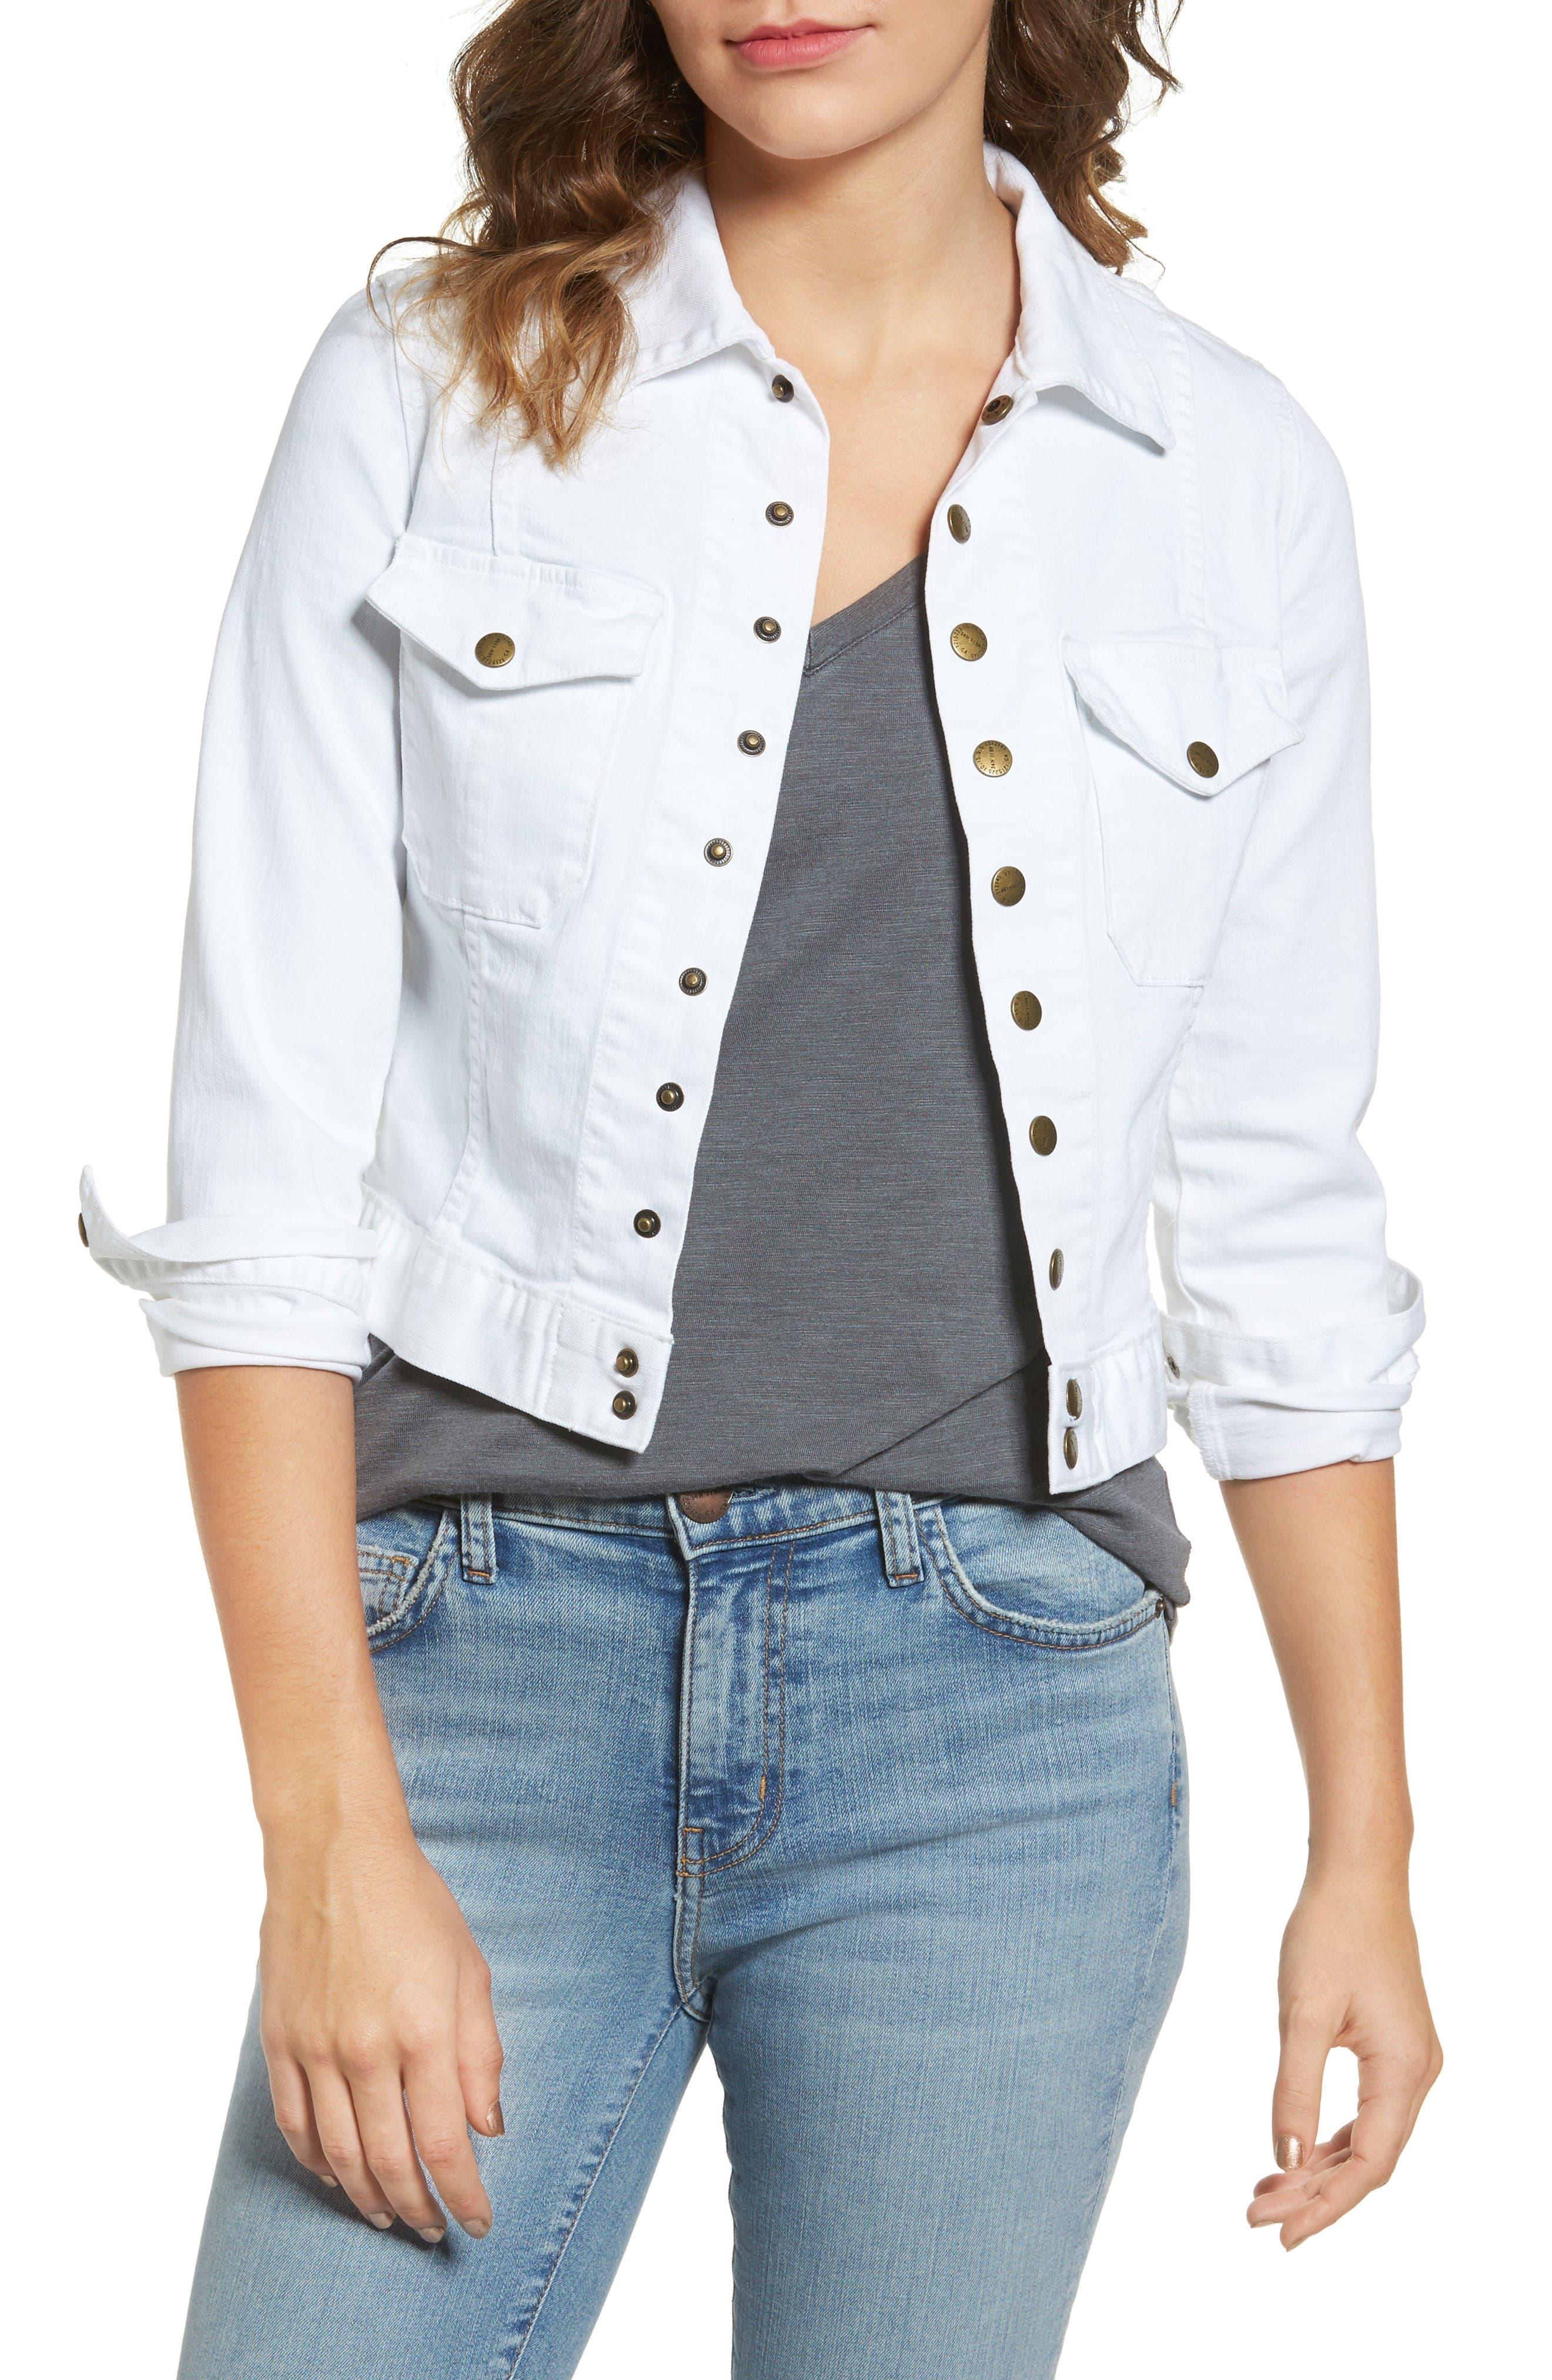 CURRENT/ELLIOTT The Snap Stretch Denim Jacket